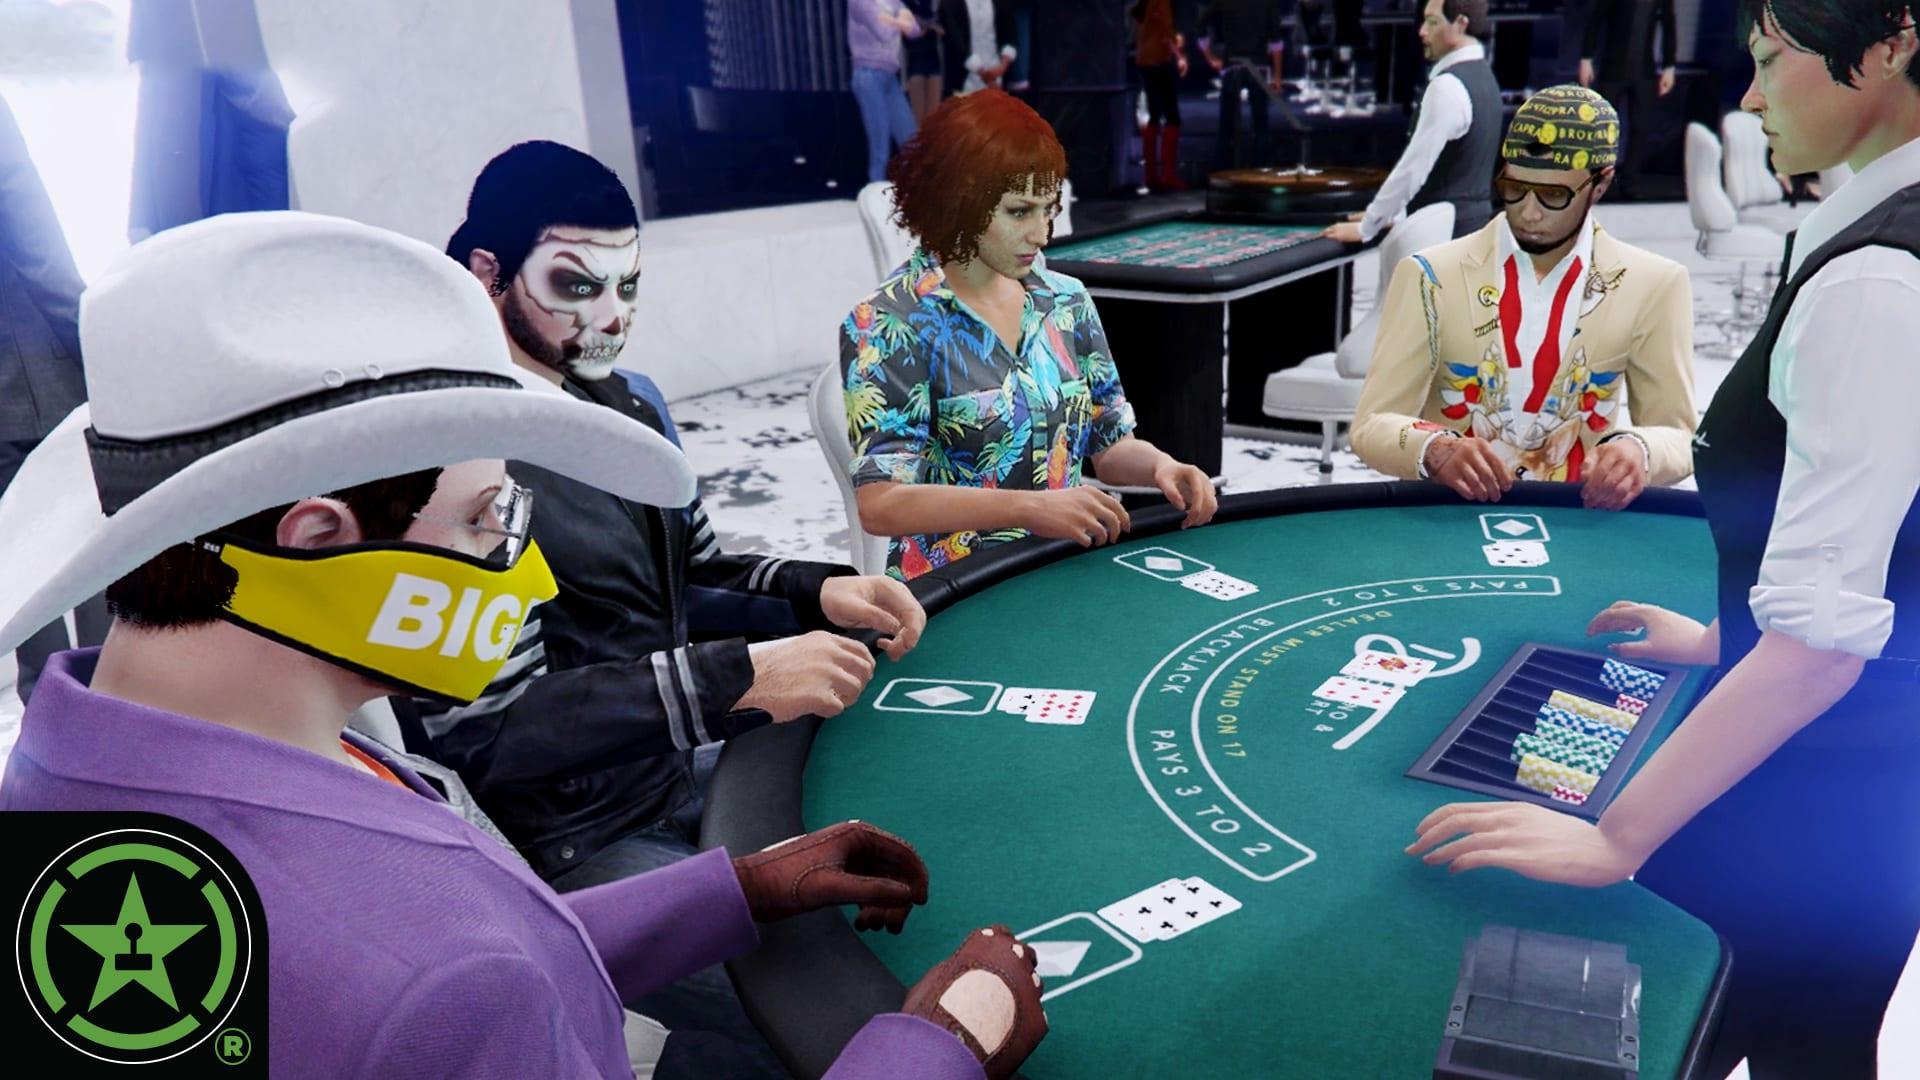 Diamond Casino Chaos - GTA V: Casino Update - Rooster Teeth